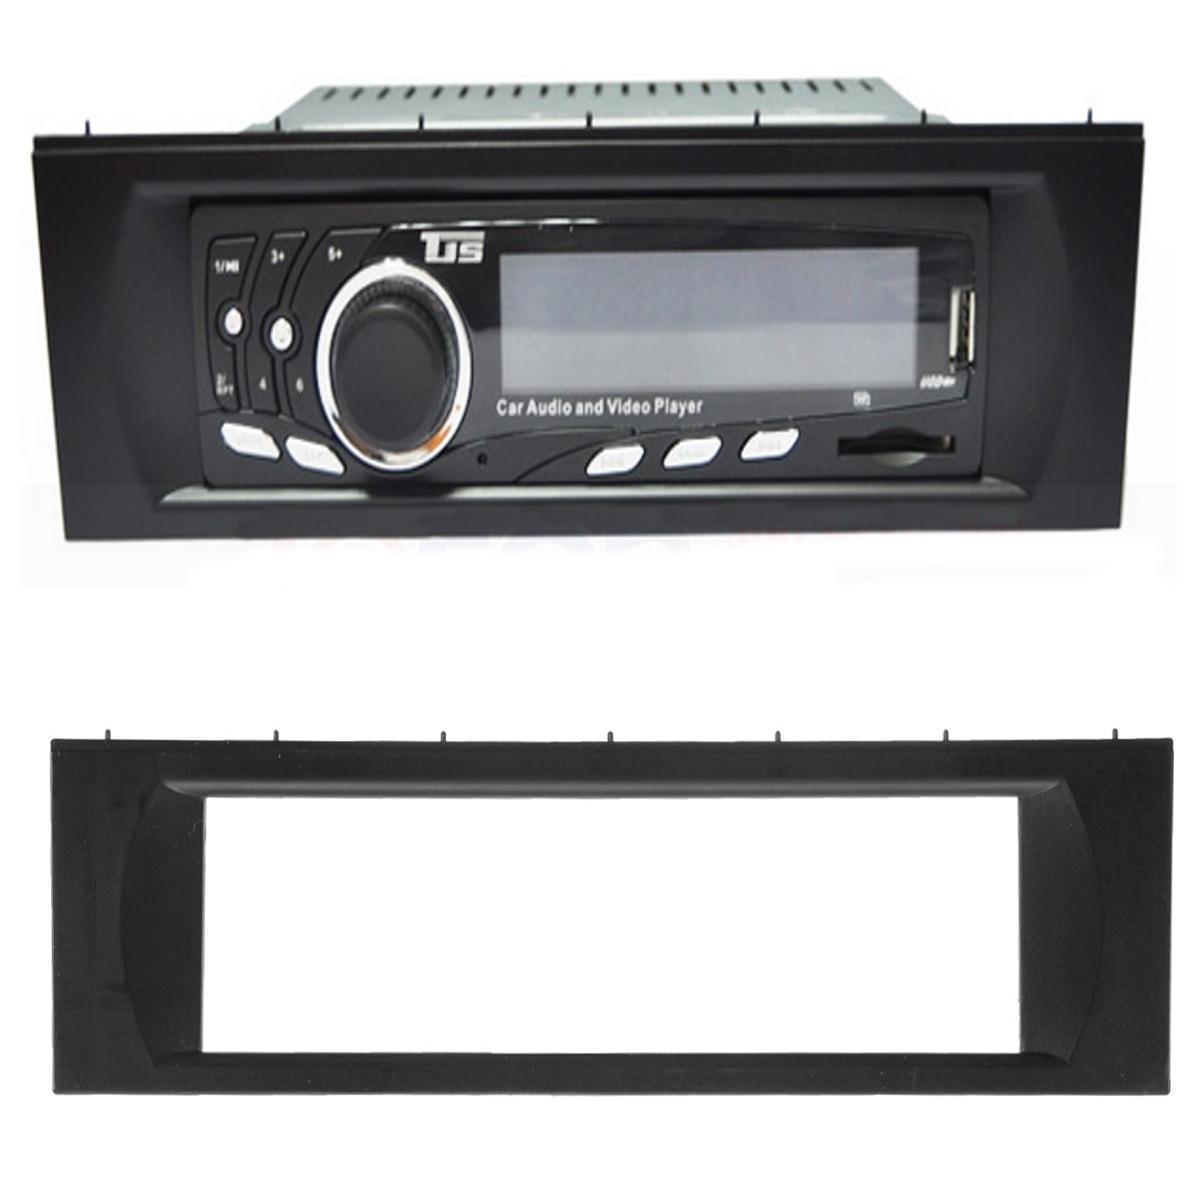 Mercedes Sprinter stereo radio Facia Fascia adapter panel plate trim CD surround